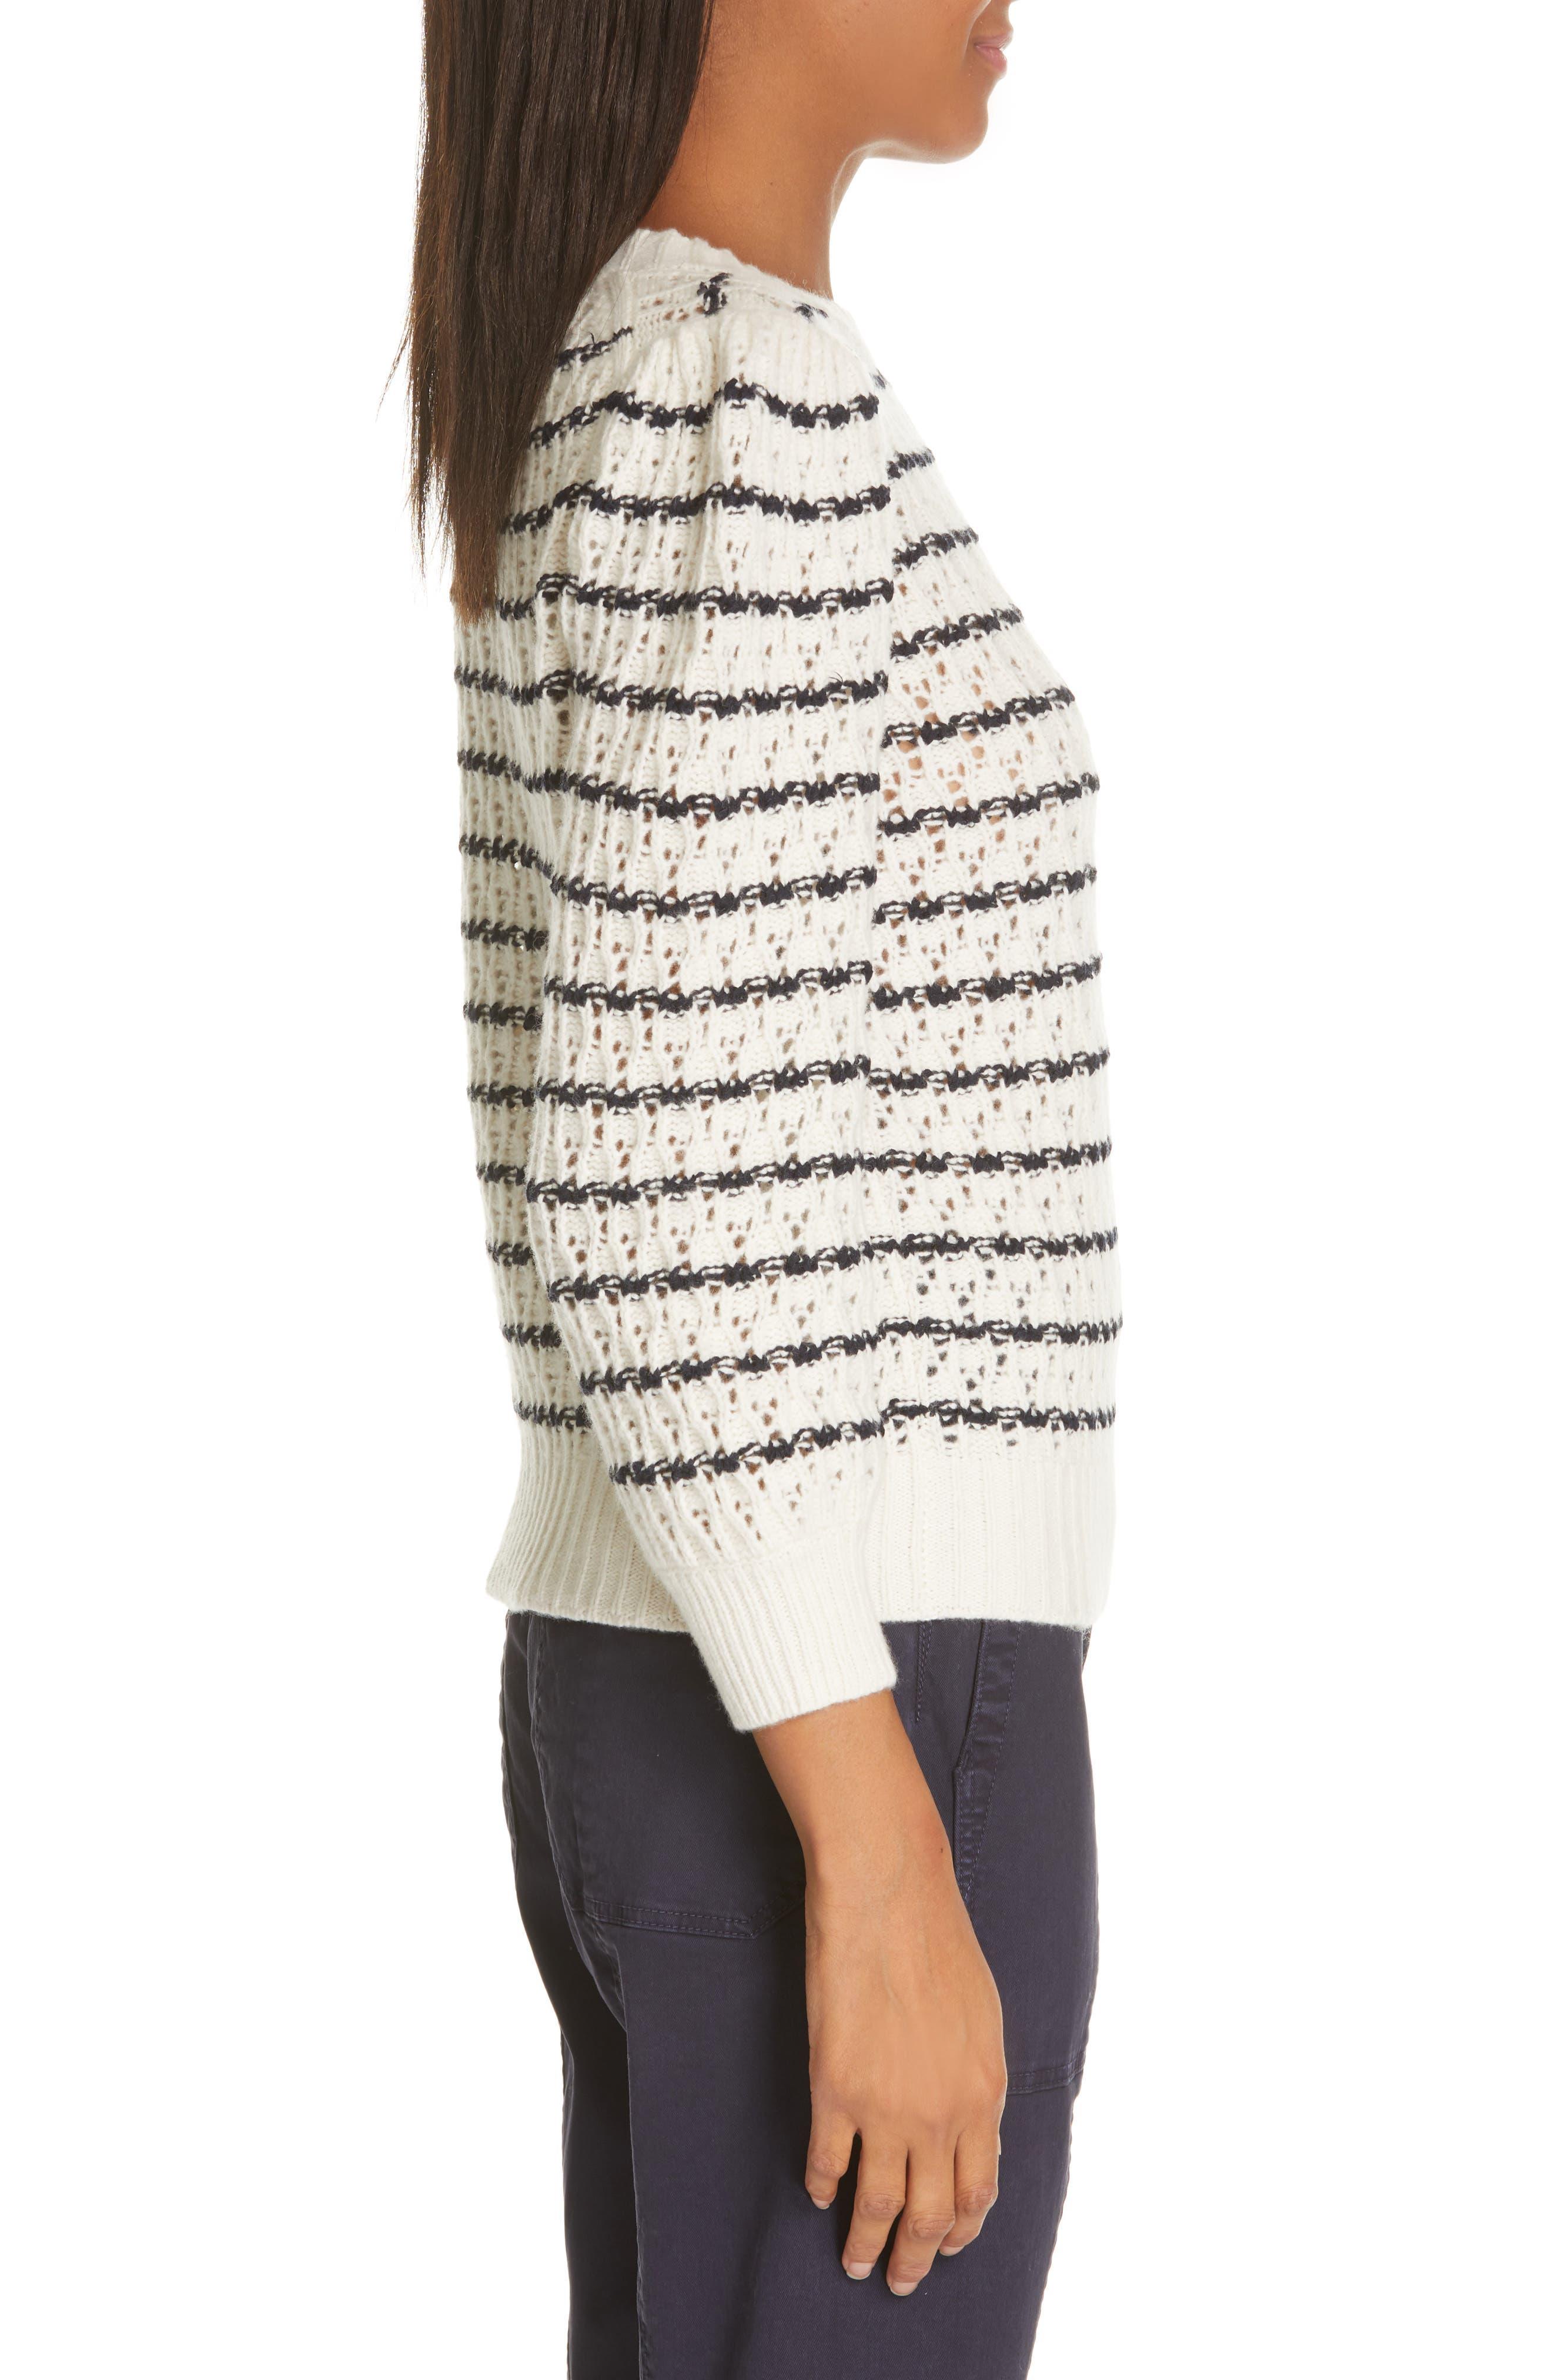 LA VIE REBECCA TAYLOR,                             Stripe Pointelle Sweater,                             Alternate thumbnail 3, color,                             ECRU/ MIDNIGHT NAVY